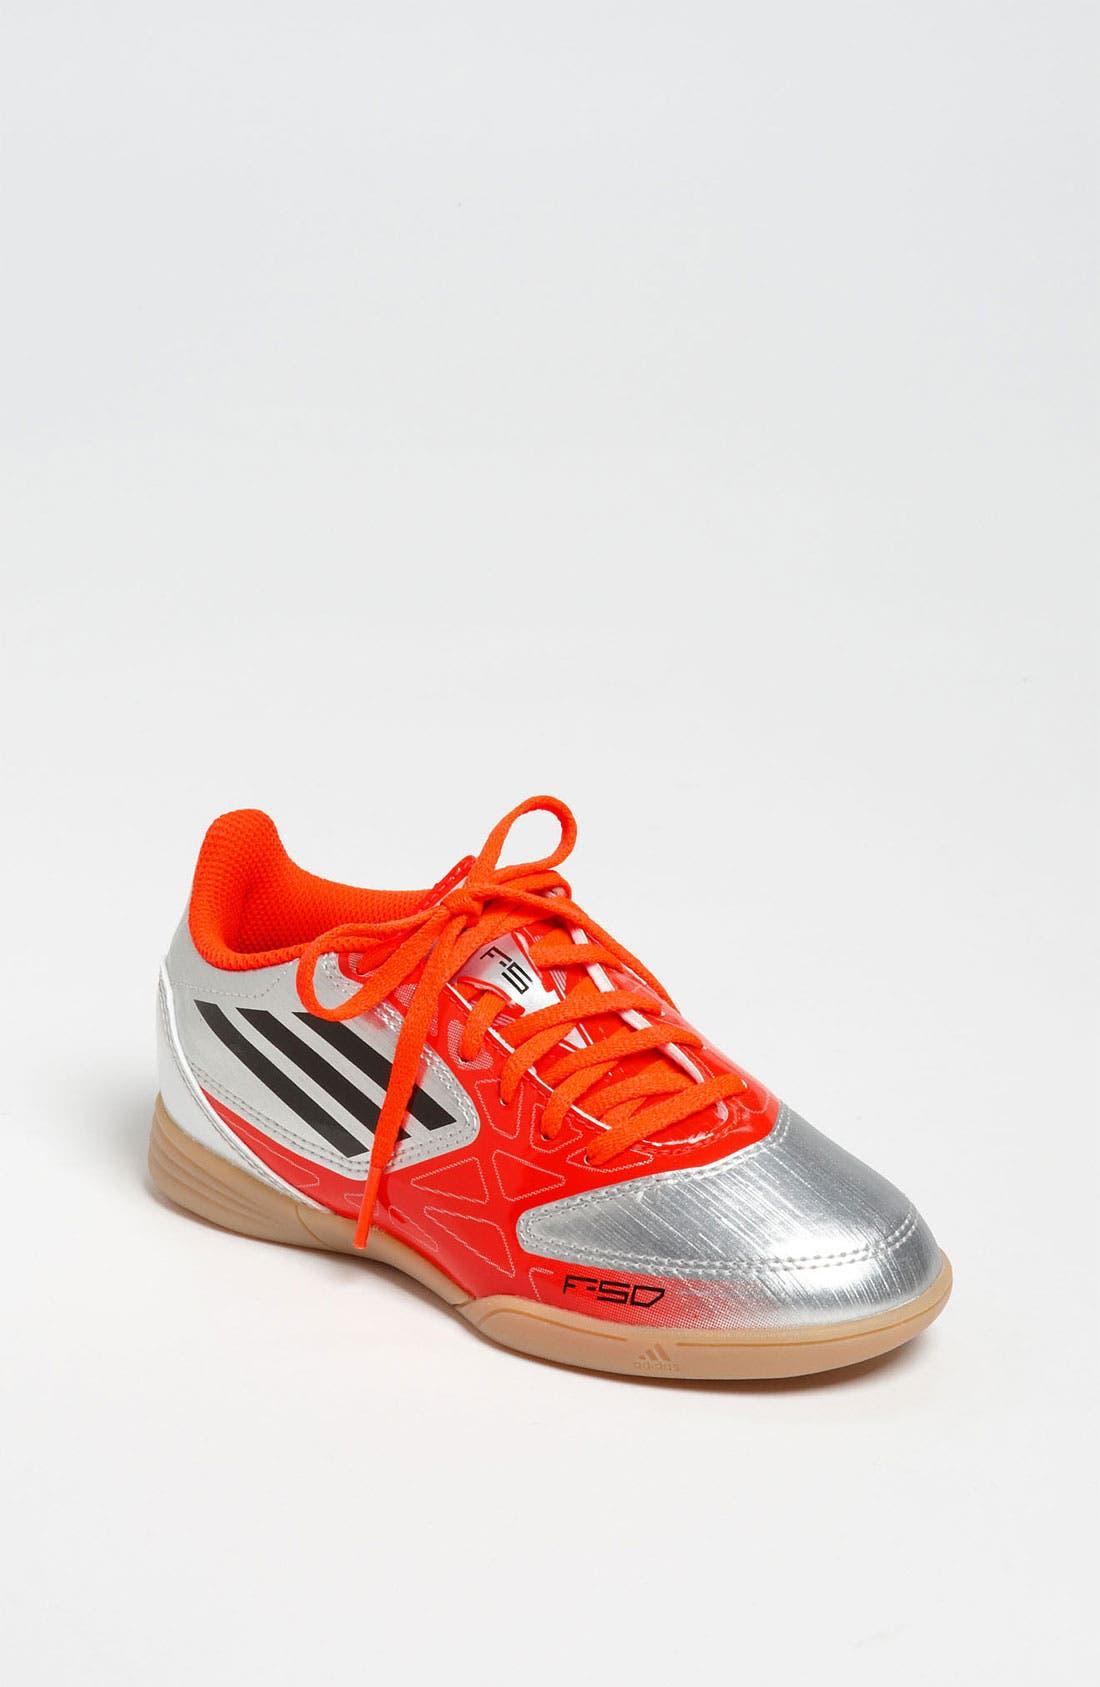 Main Image - adidas 'F10' Soccer Sneaker (Toddler, Little Kid & Big Kid)